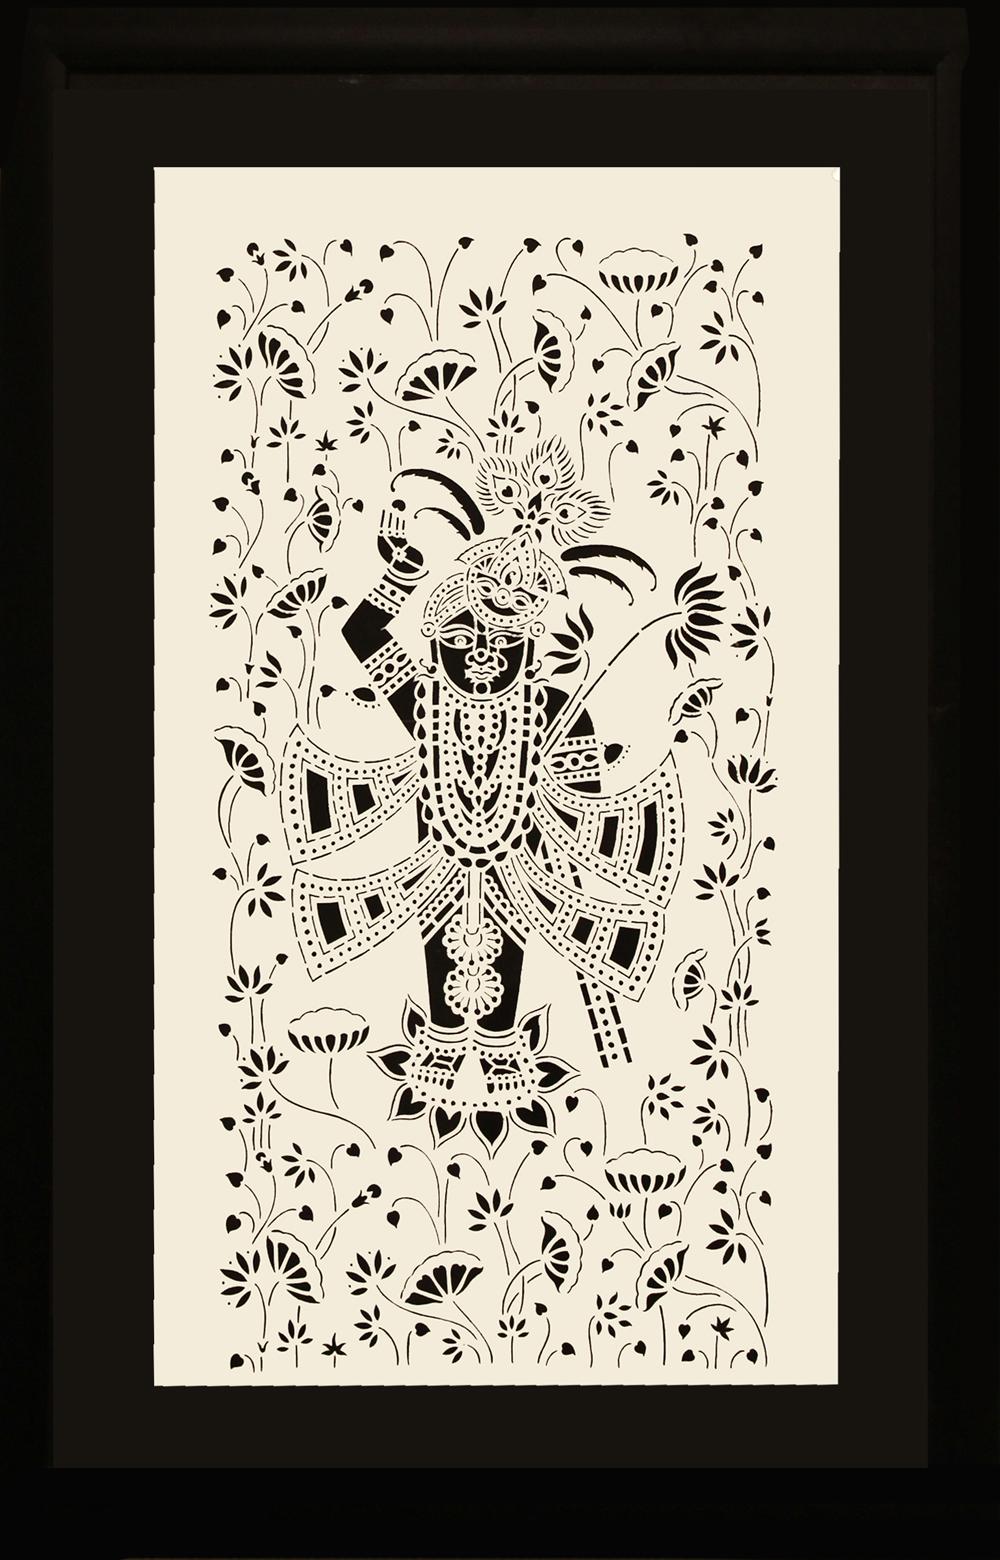 Shree Nathji (Lotus)